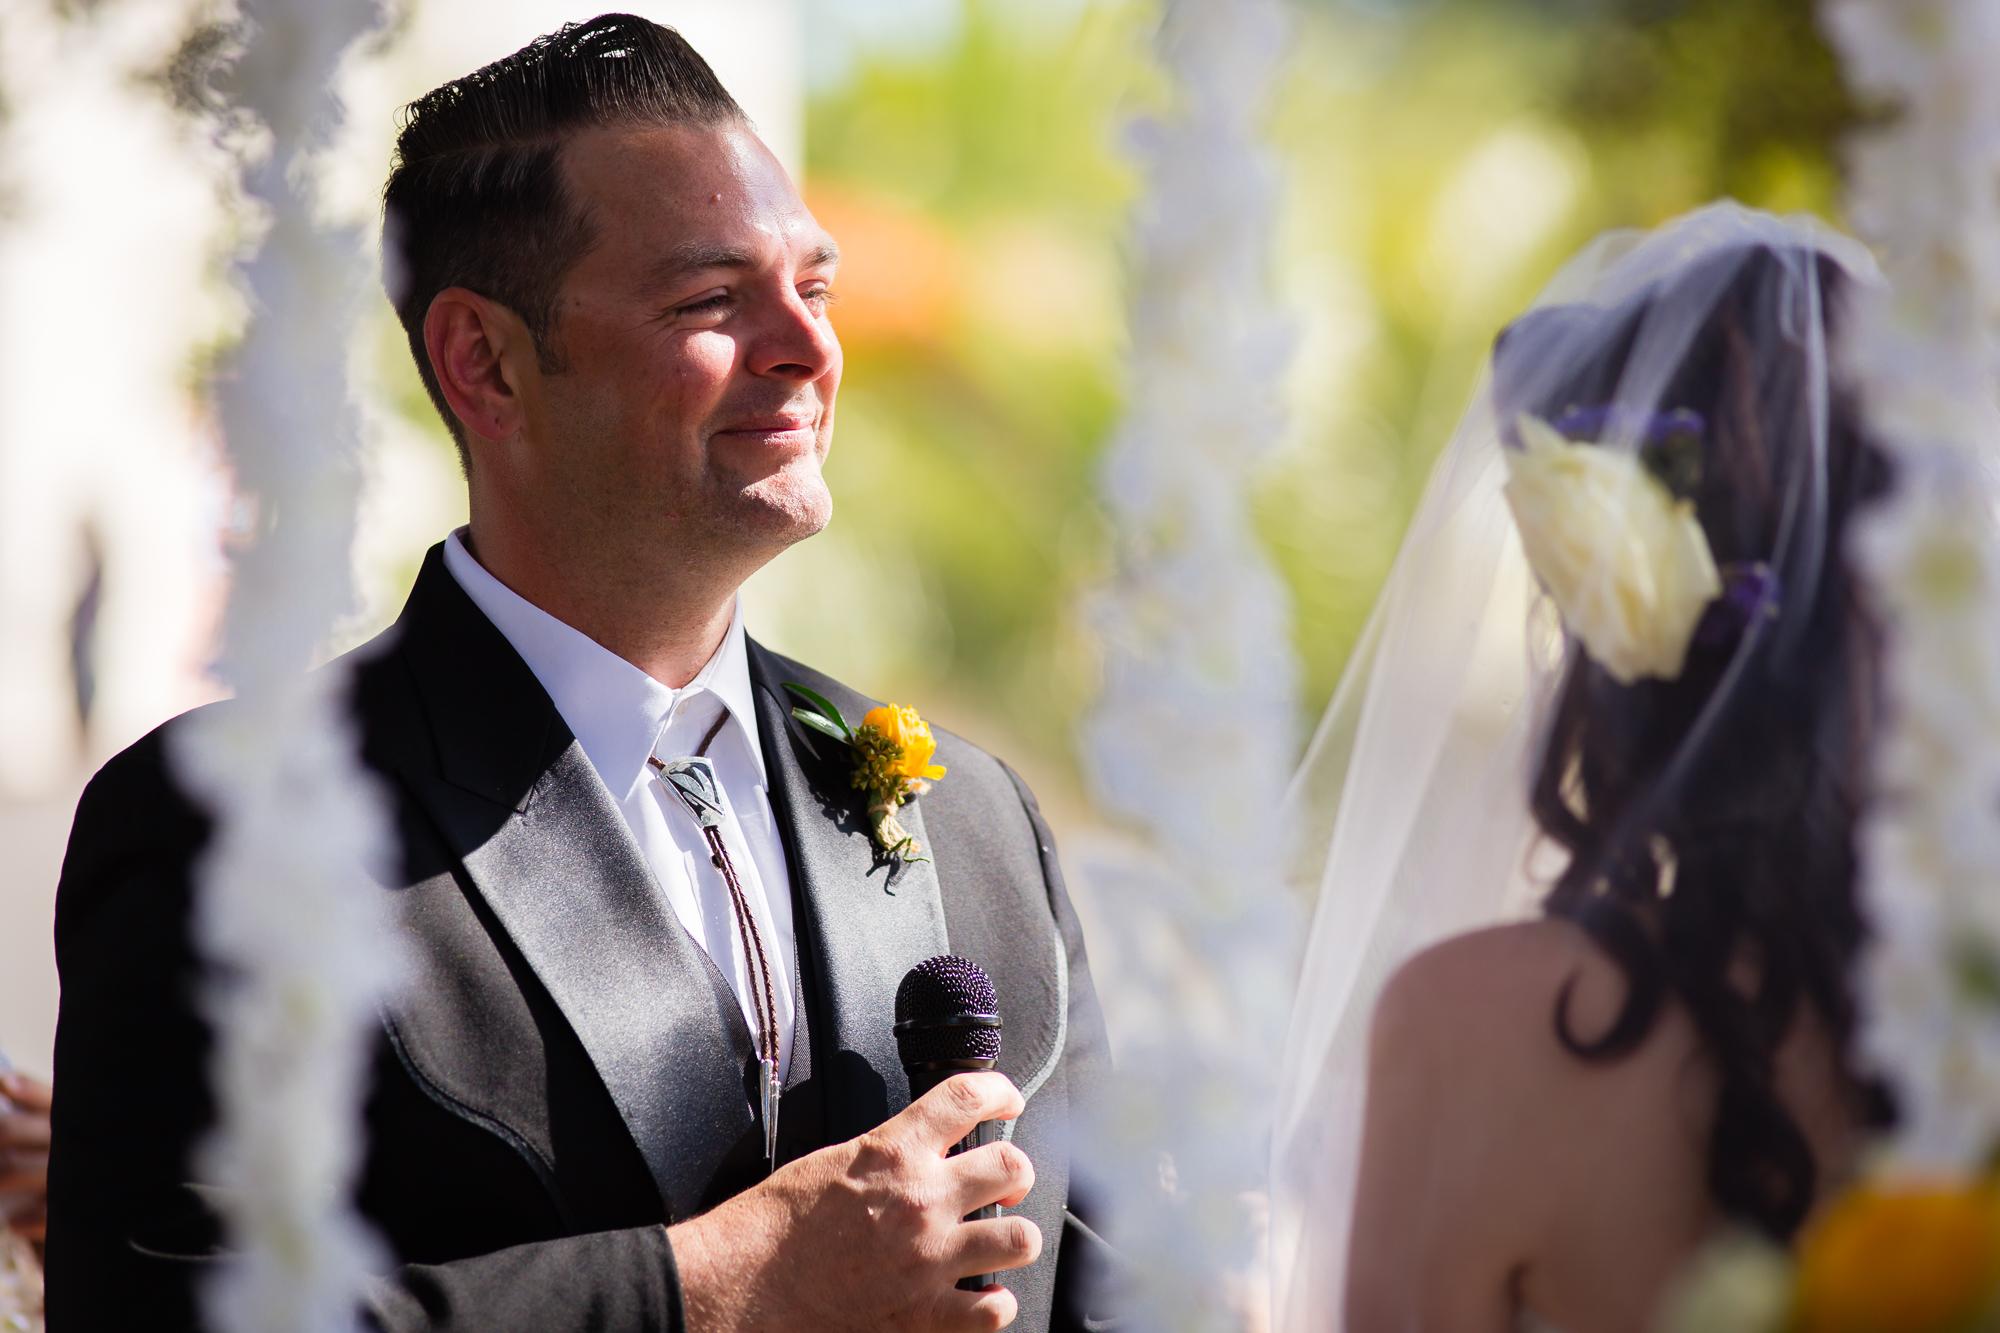 Gary-Kasl-SandKasl-Imaging-Wedding-Photography-31.jpg